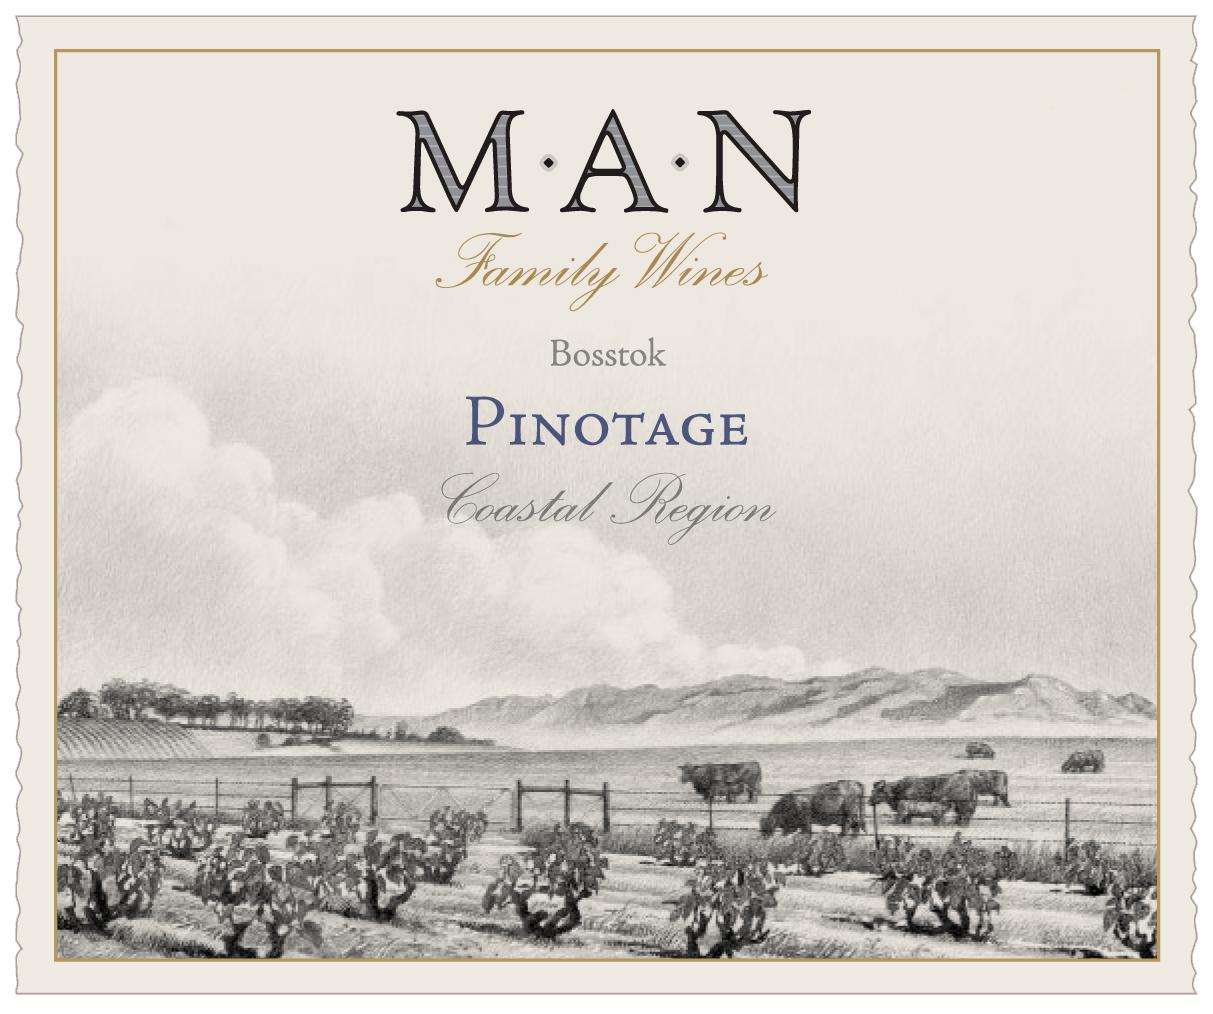 Wine Spectator: 11 Impressive South African Values | 2/8/18